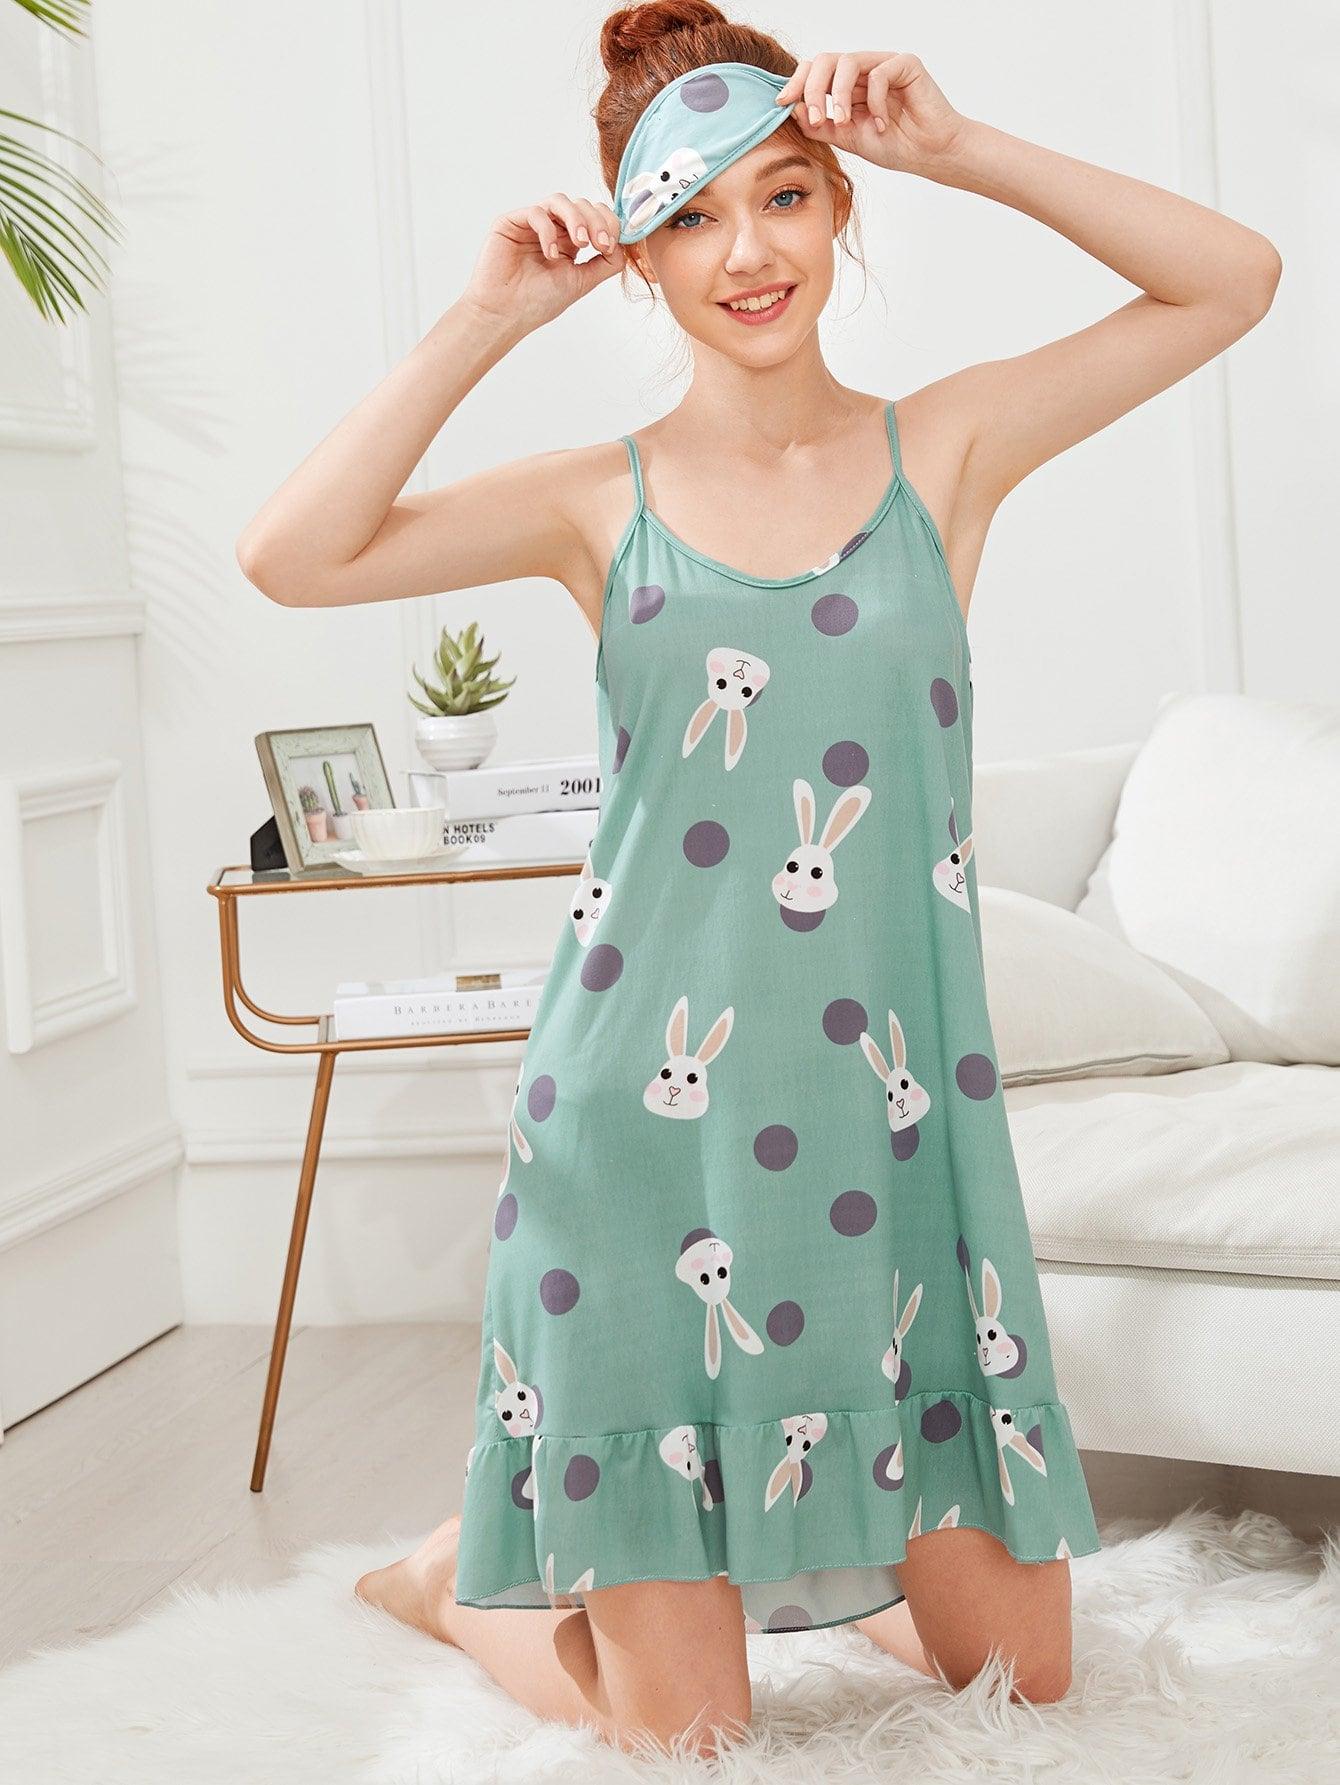 Rabbit Print Cami Dress With Eye Mask rabbit print pullover